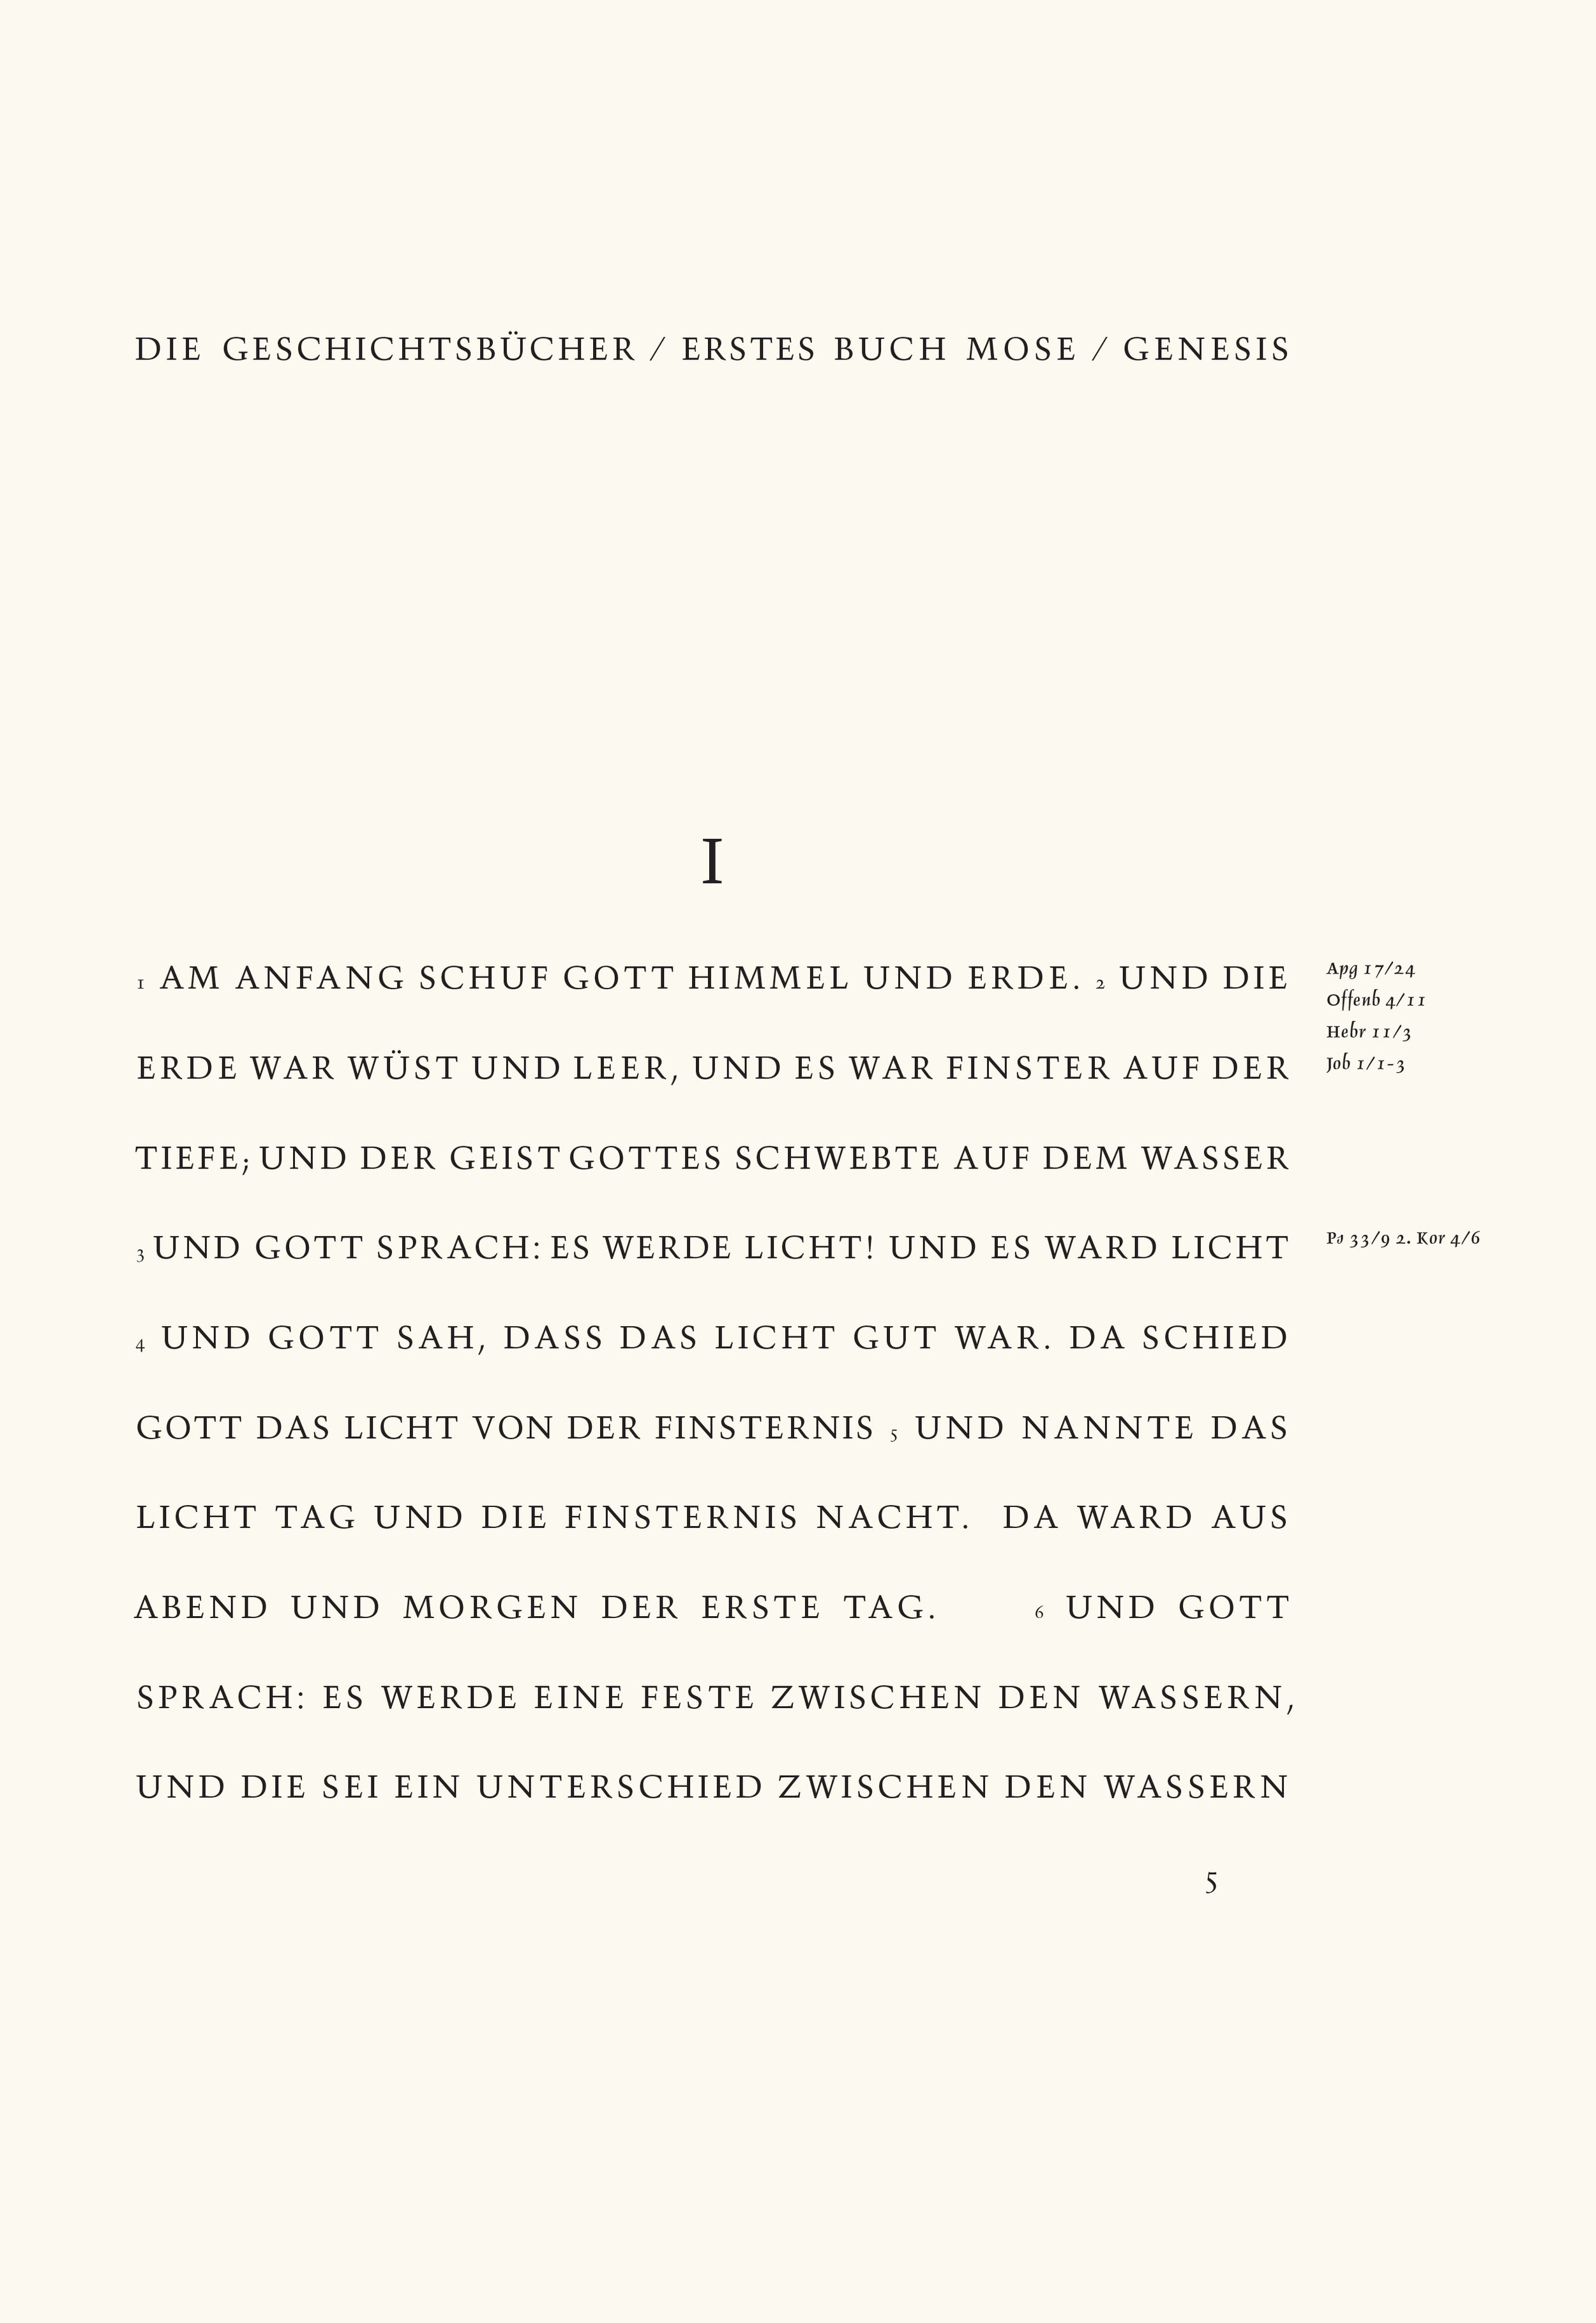 JOSEF KAUFER  Munich, 1955  Trump Mediaeval  21.3 X 31 cm  Letterpress  Liber Librorum Collection